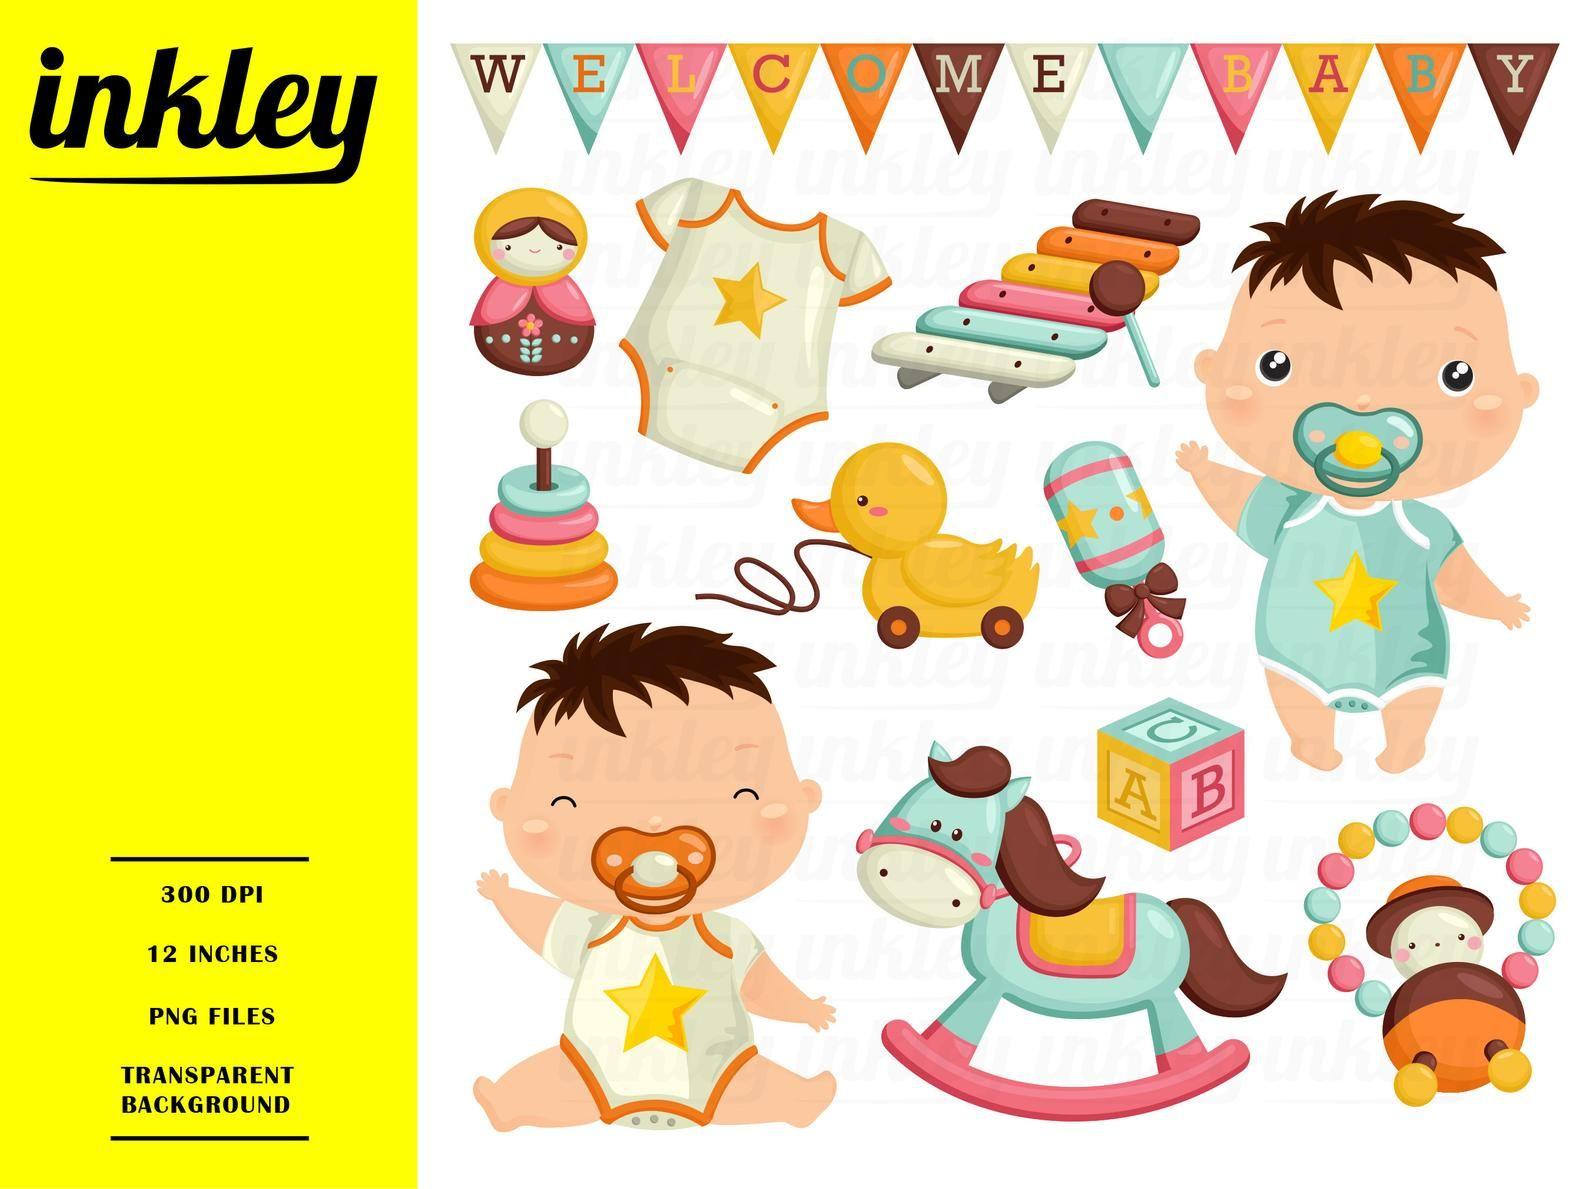 Baby Boy Clipart Cute Baby Clip Art Baby Toys Free Svg On Etsy Baby Clip Art Clip Art Baby Boy Toys